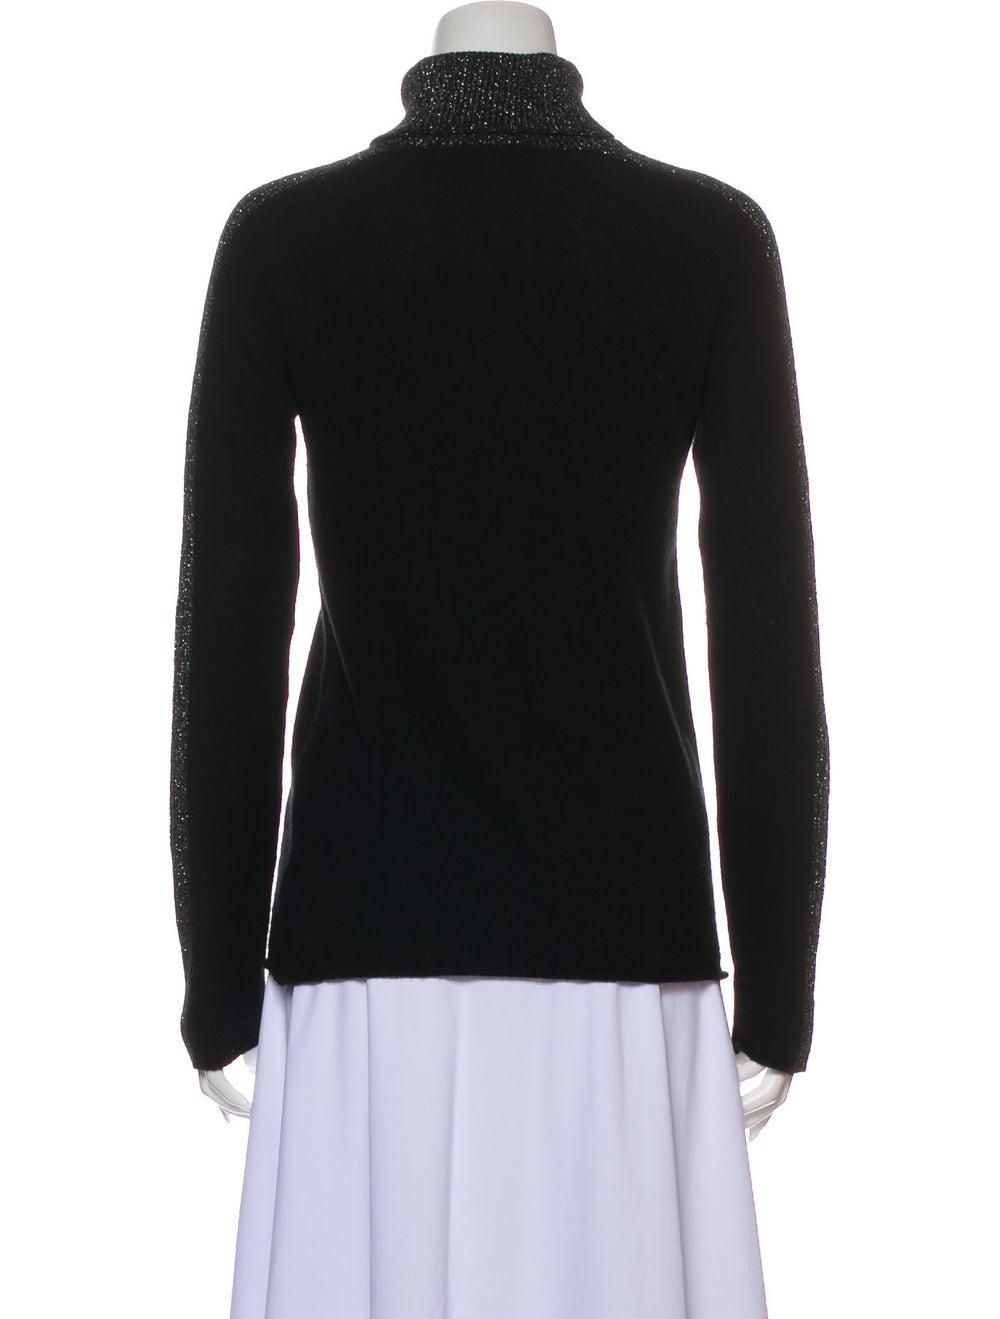 ATM Cashmere Turtleneck Sweater Black - image 3